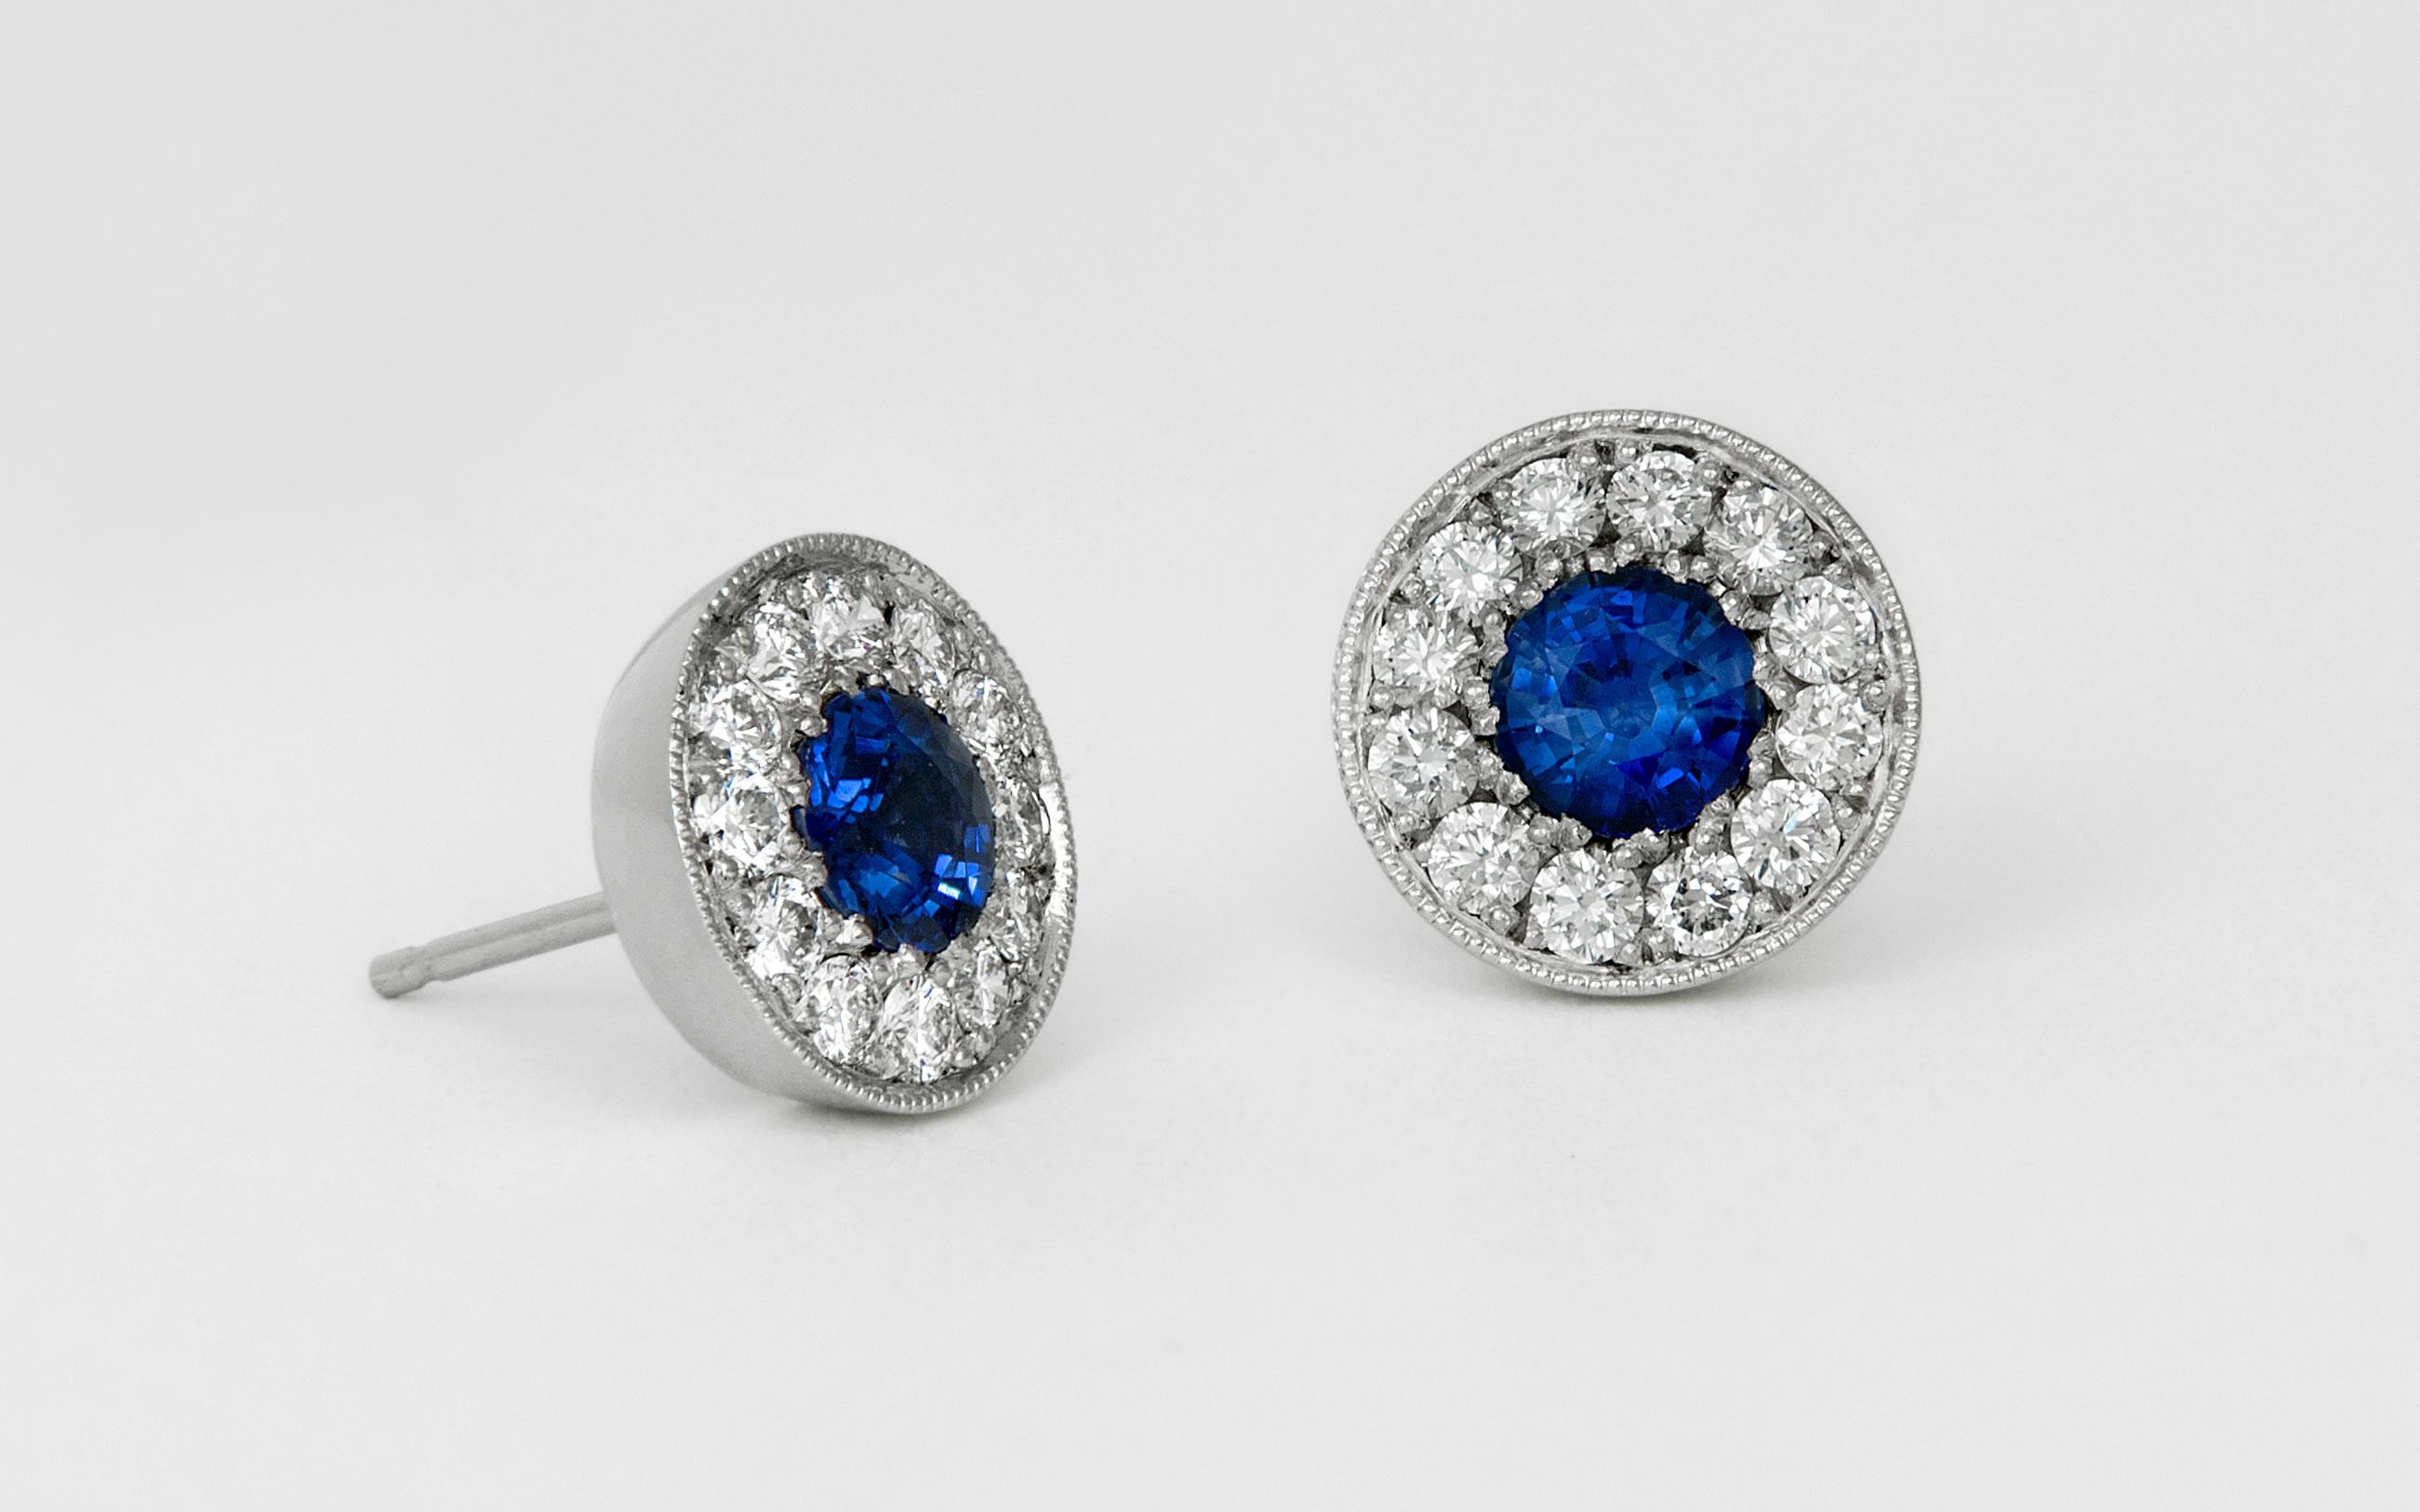 14KW Sapphire and Diamond Halo Earrings